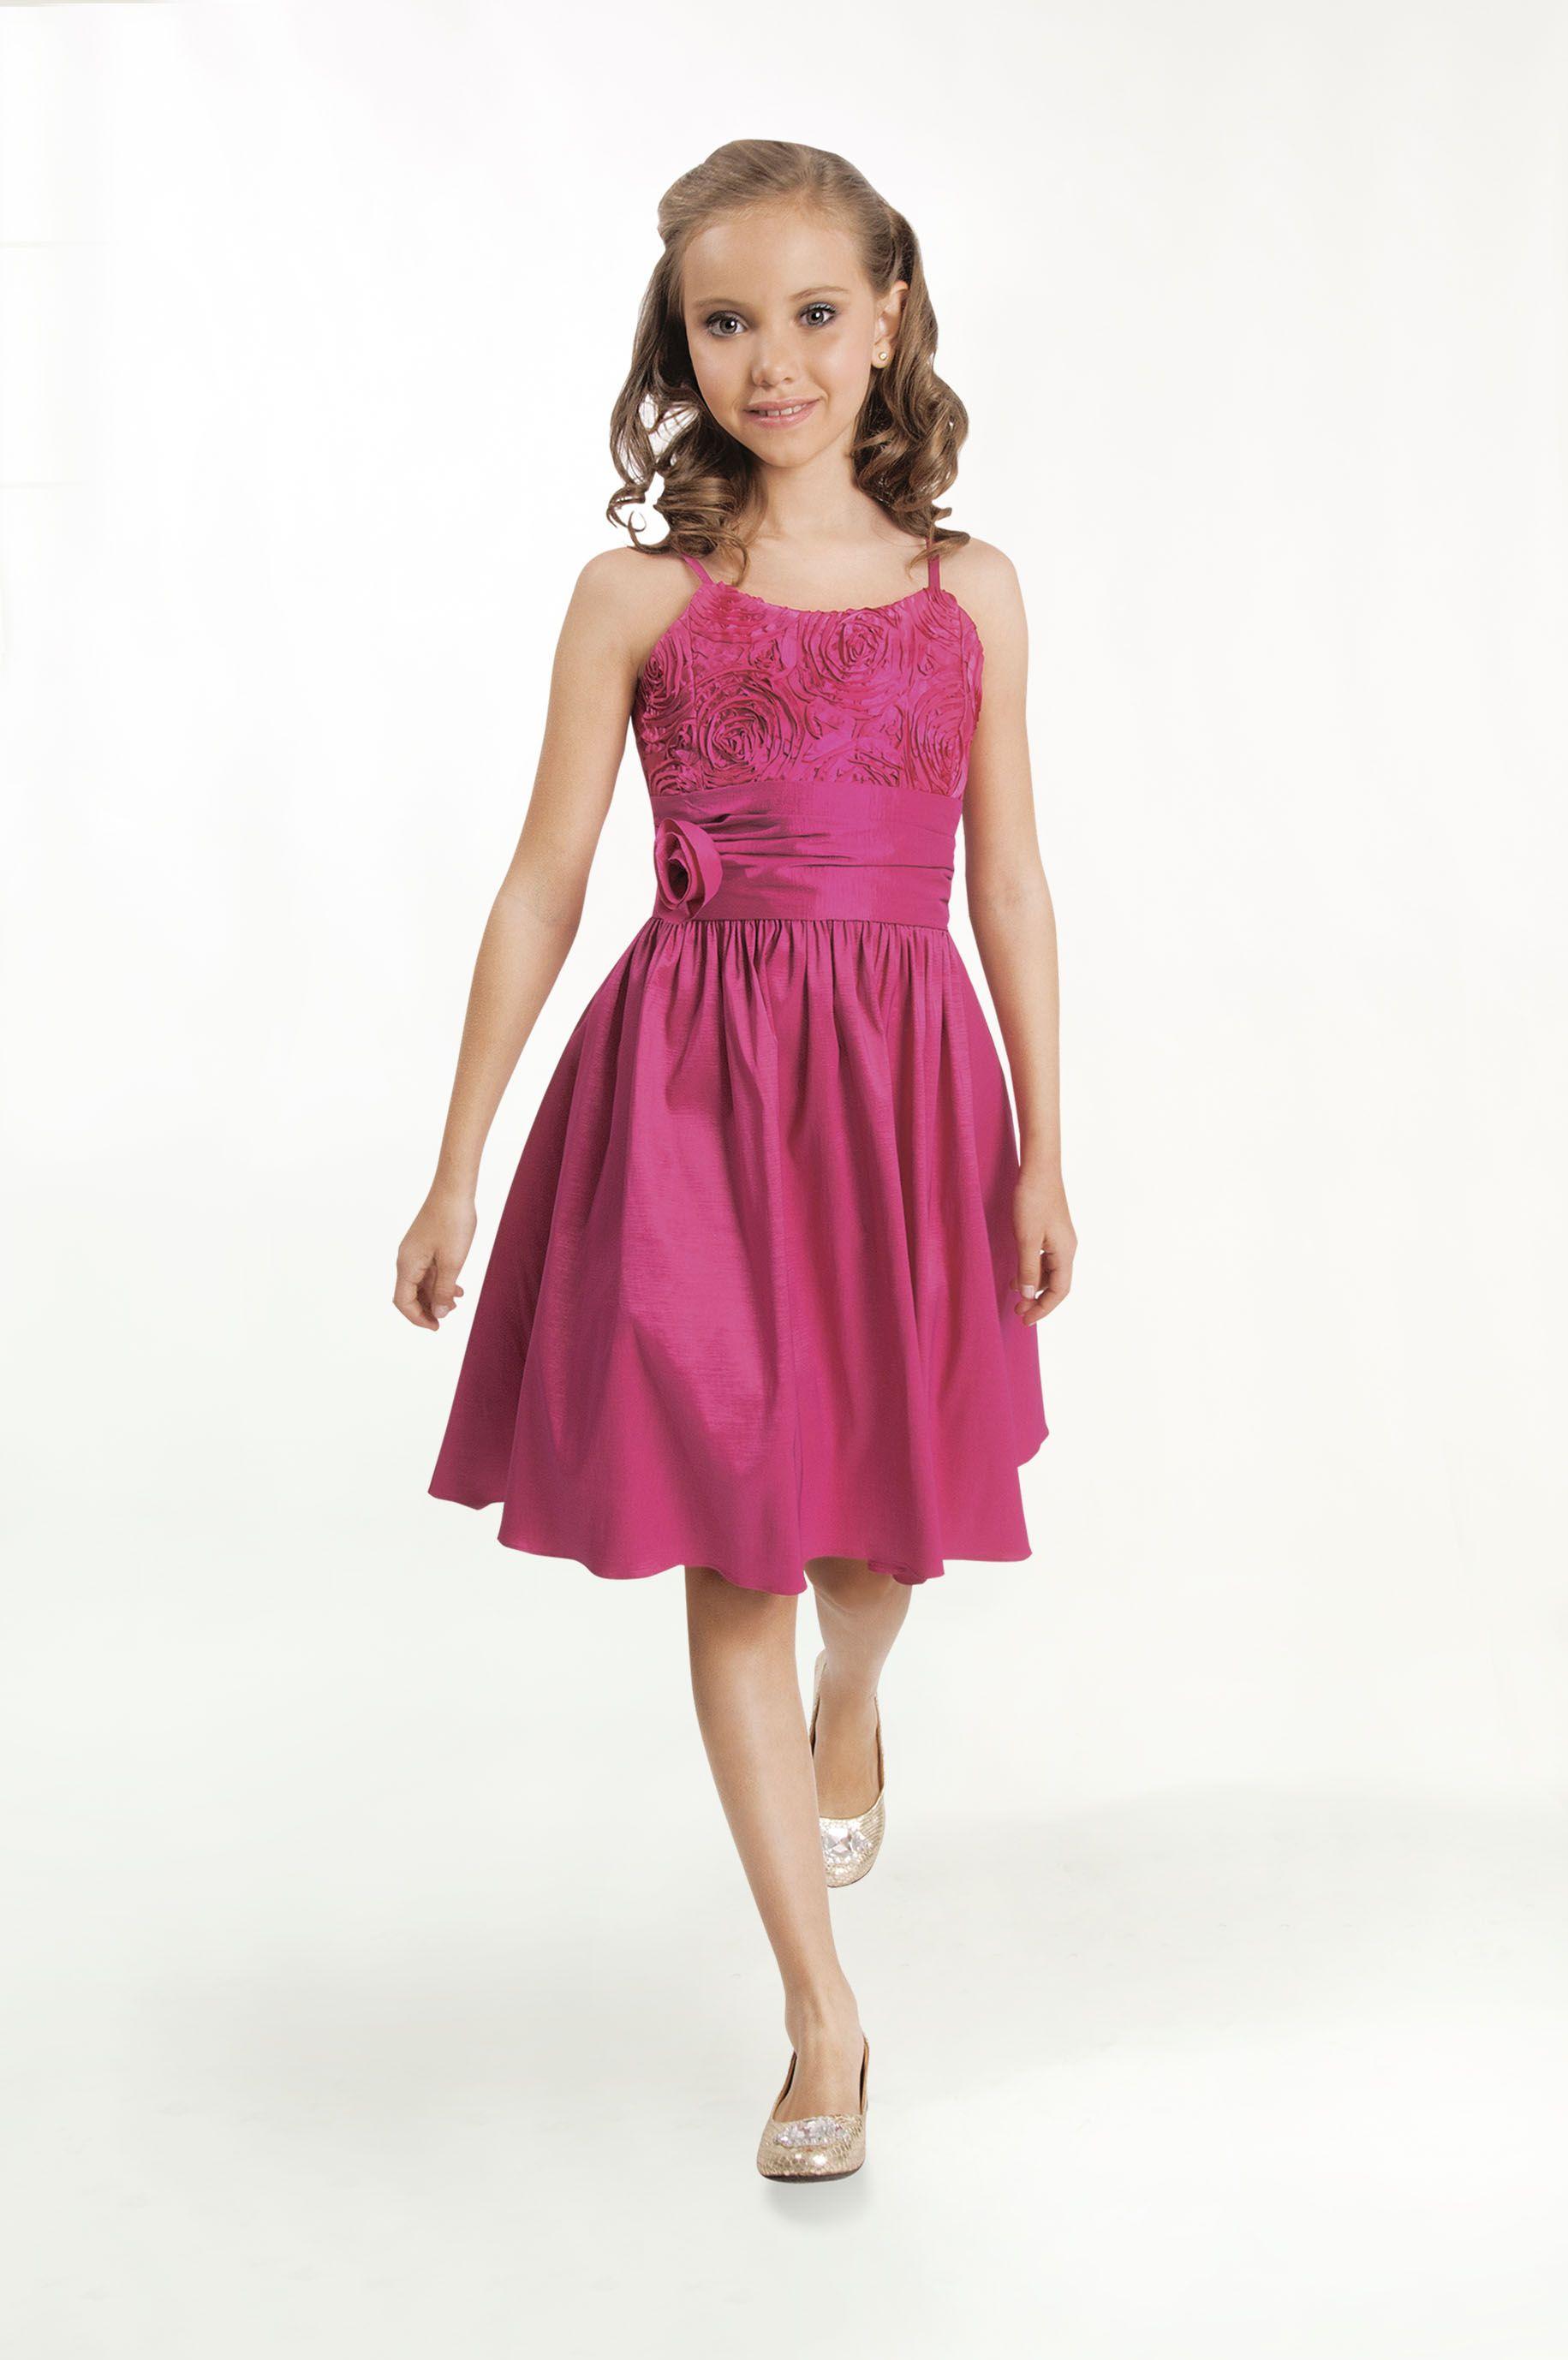 Modelo Vestido 3CC02123 - $999 | Liz Minelli Niñas 2013 | Pinterest ...